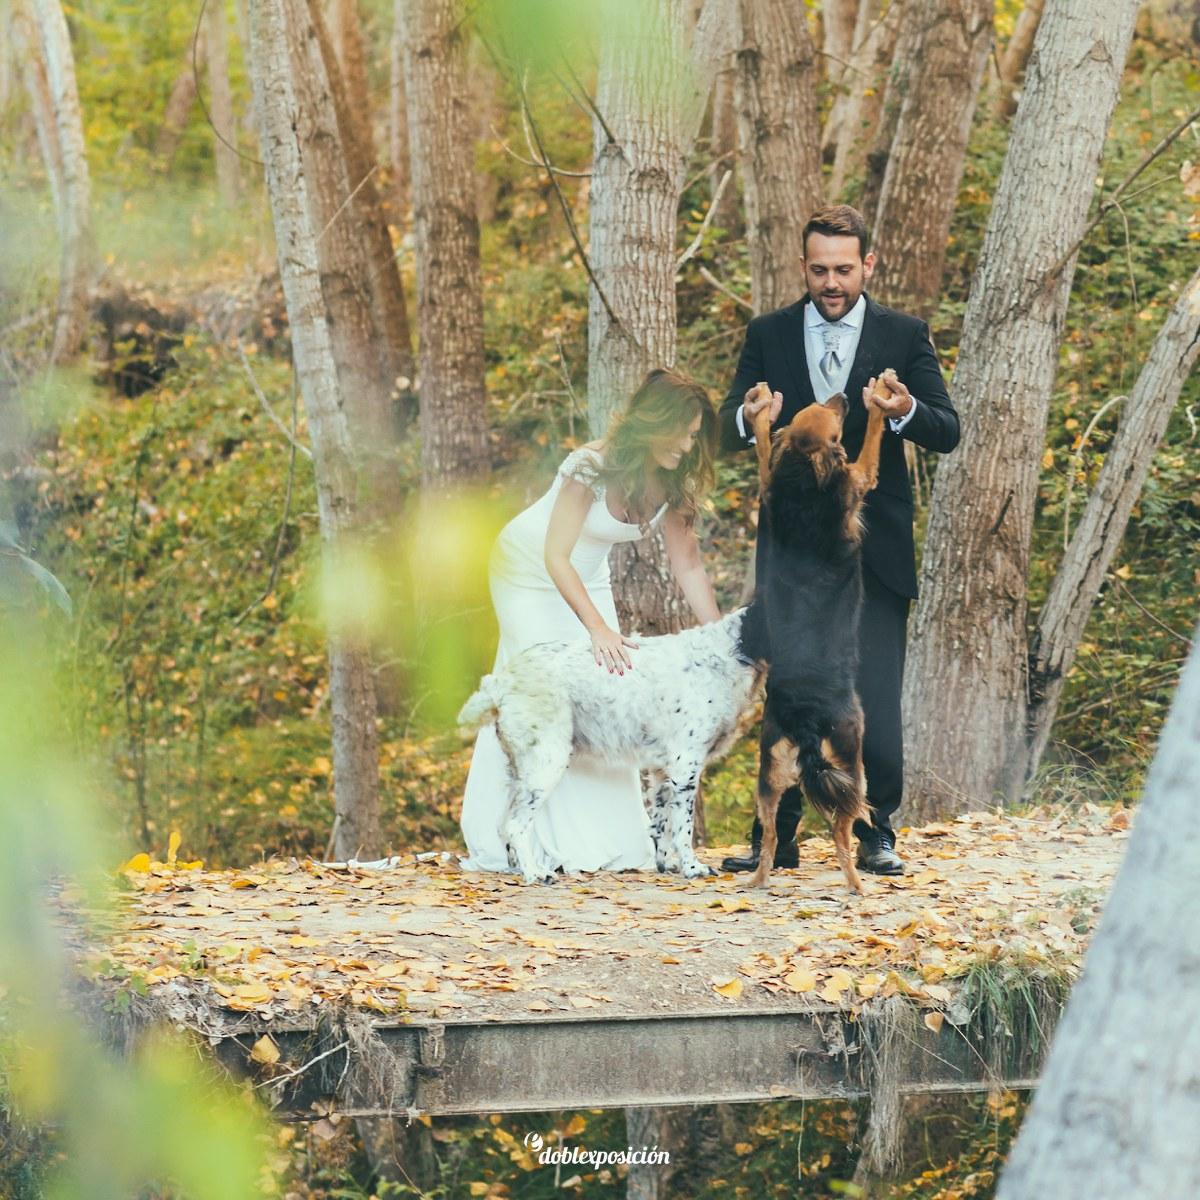 fotografos-boda-elche-alicante-reportaje-bosque-postboda-012